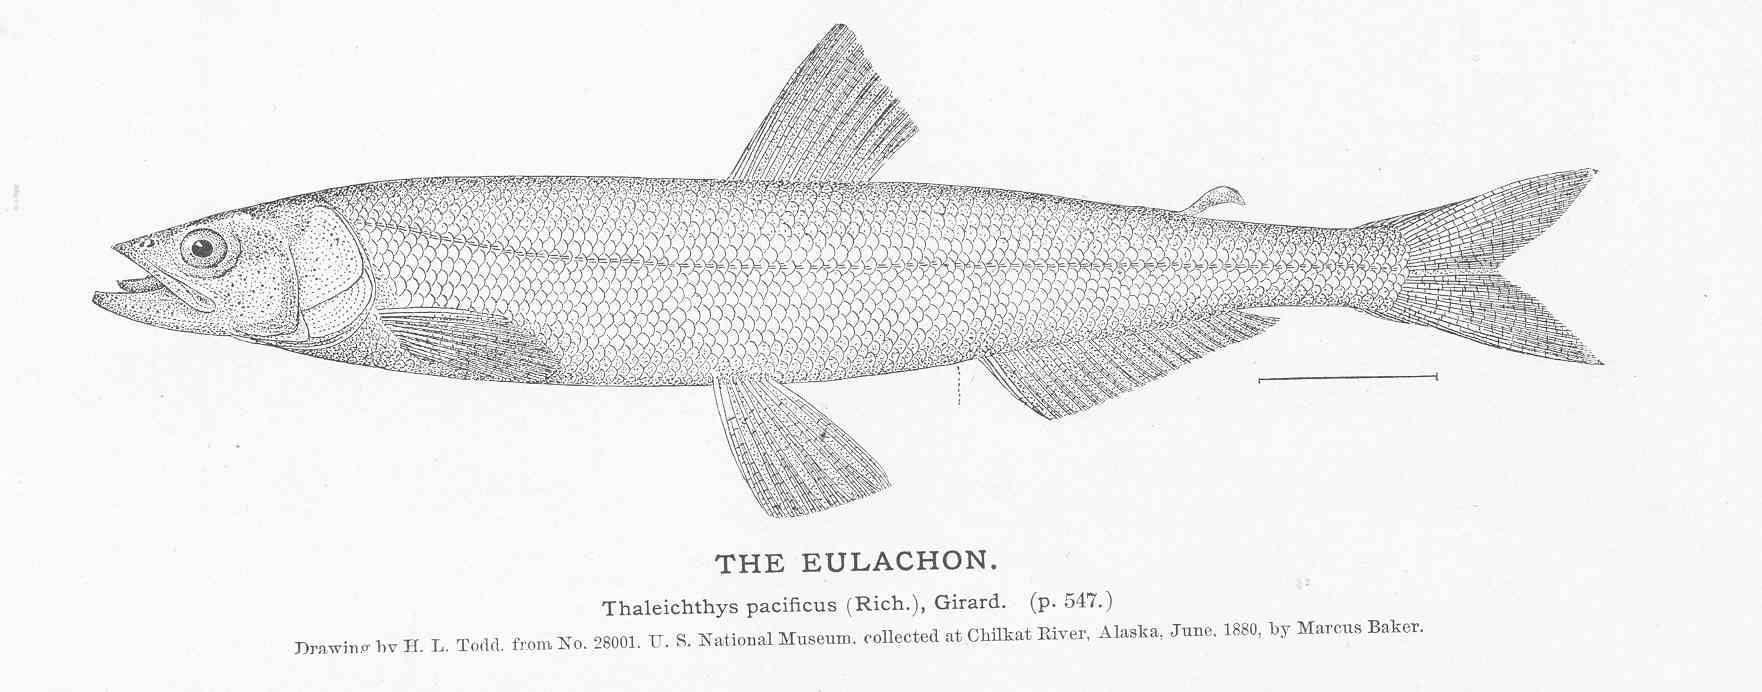 Image of Eulachon